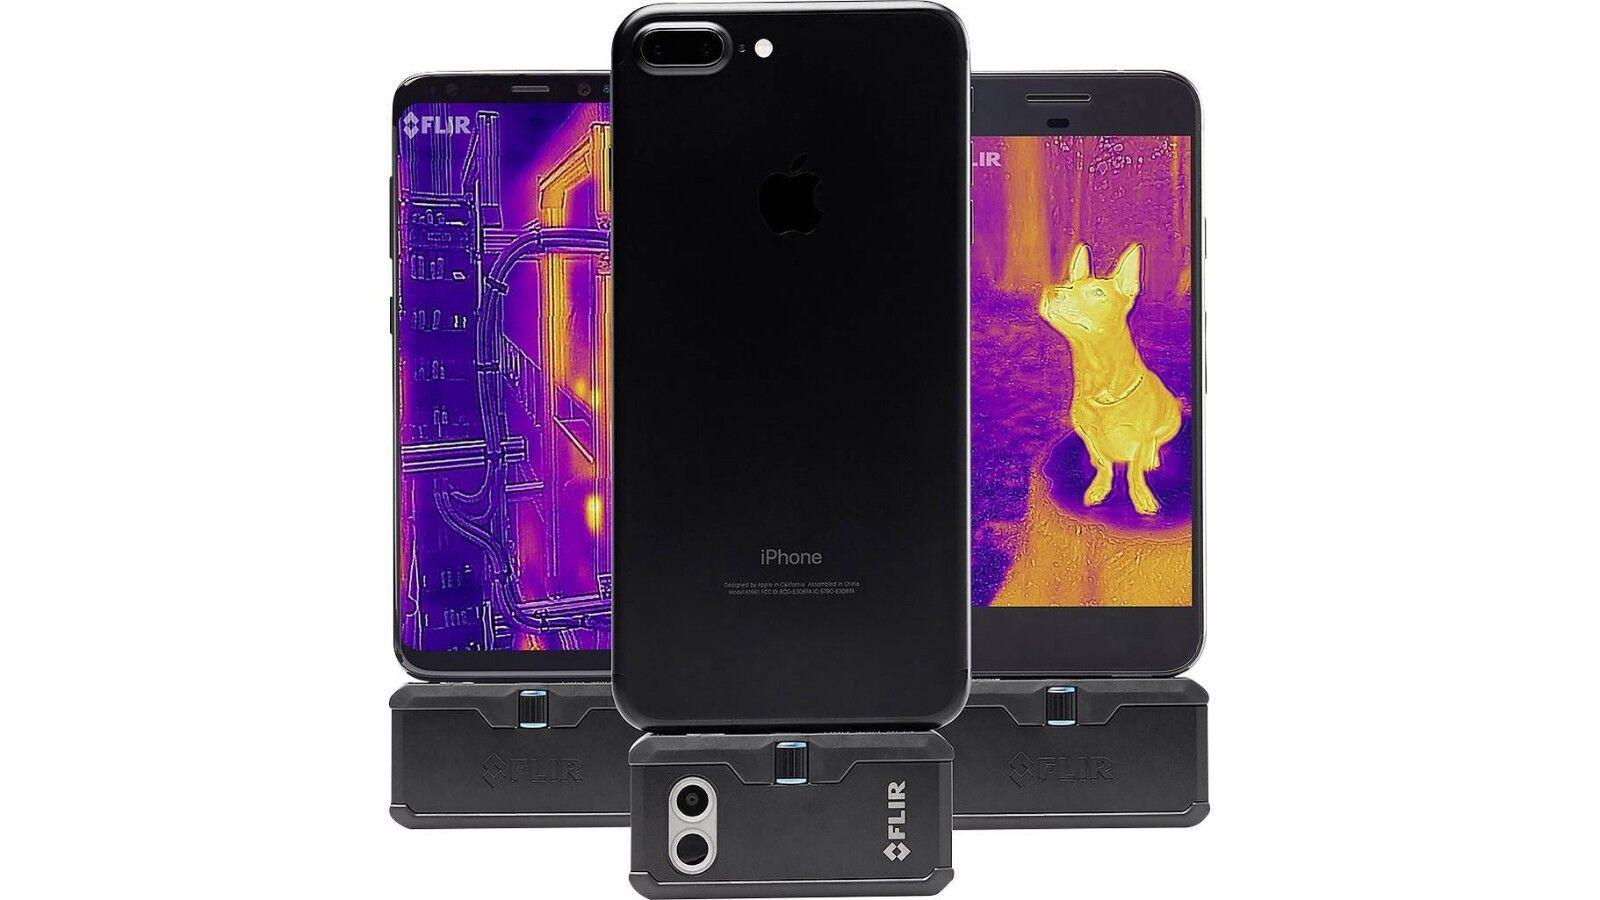 Flir ONE PRO LT USB-C Android Wärmebildkamera -20 bis 120 °C 80 x 60 Pixel